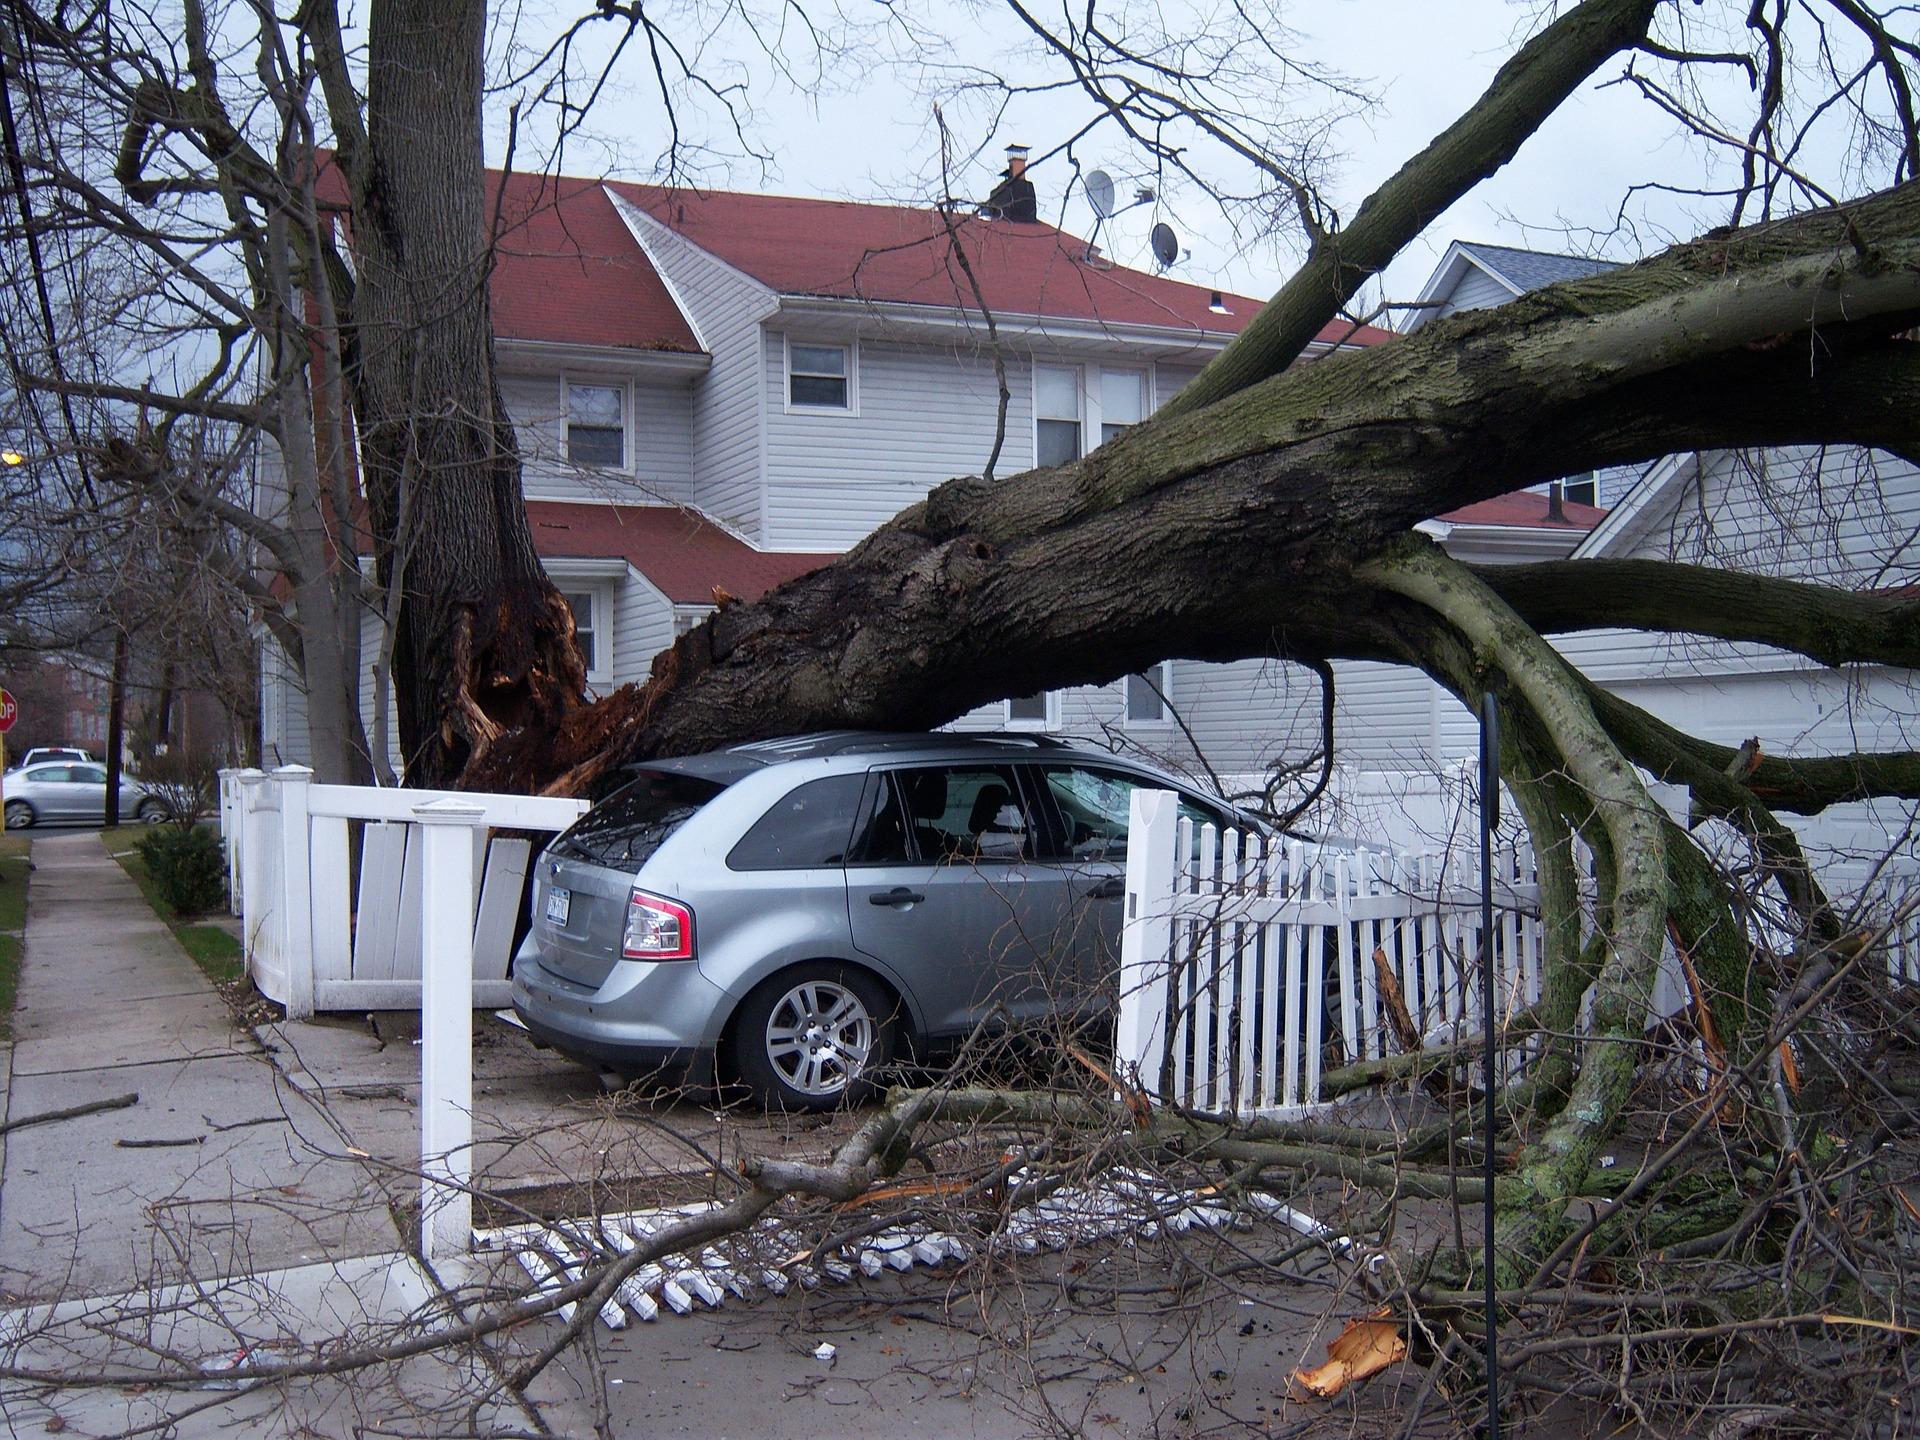 sherwood ar emergency tree service services